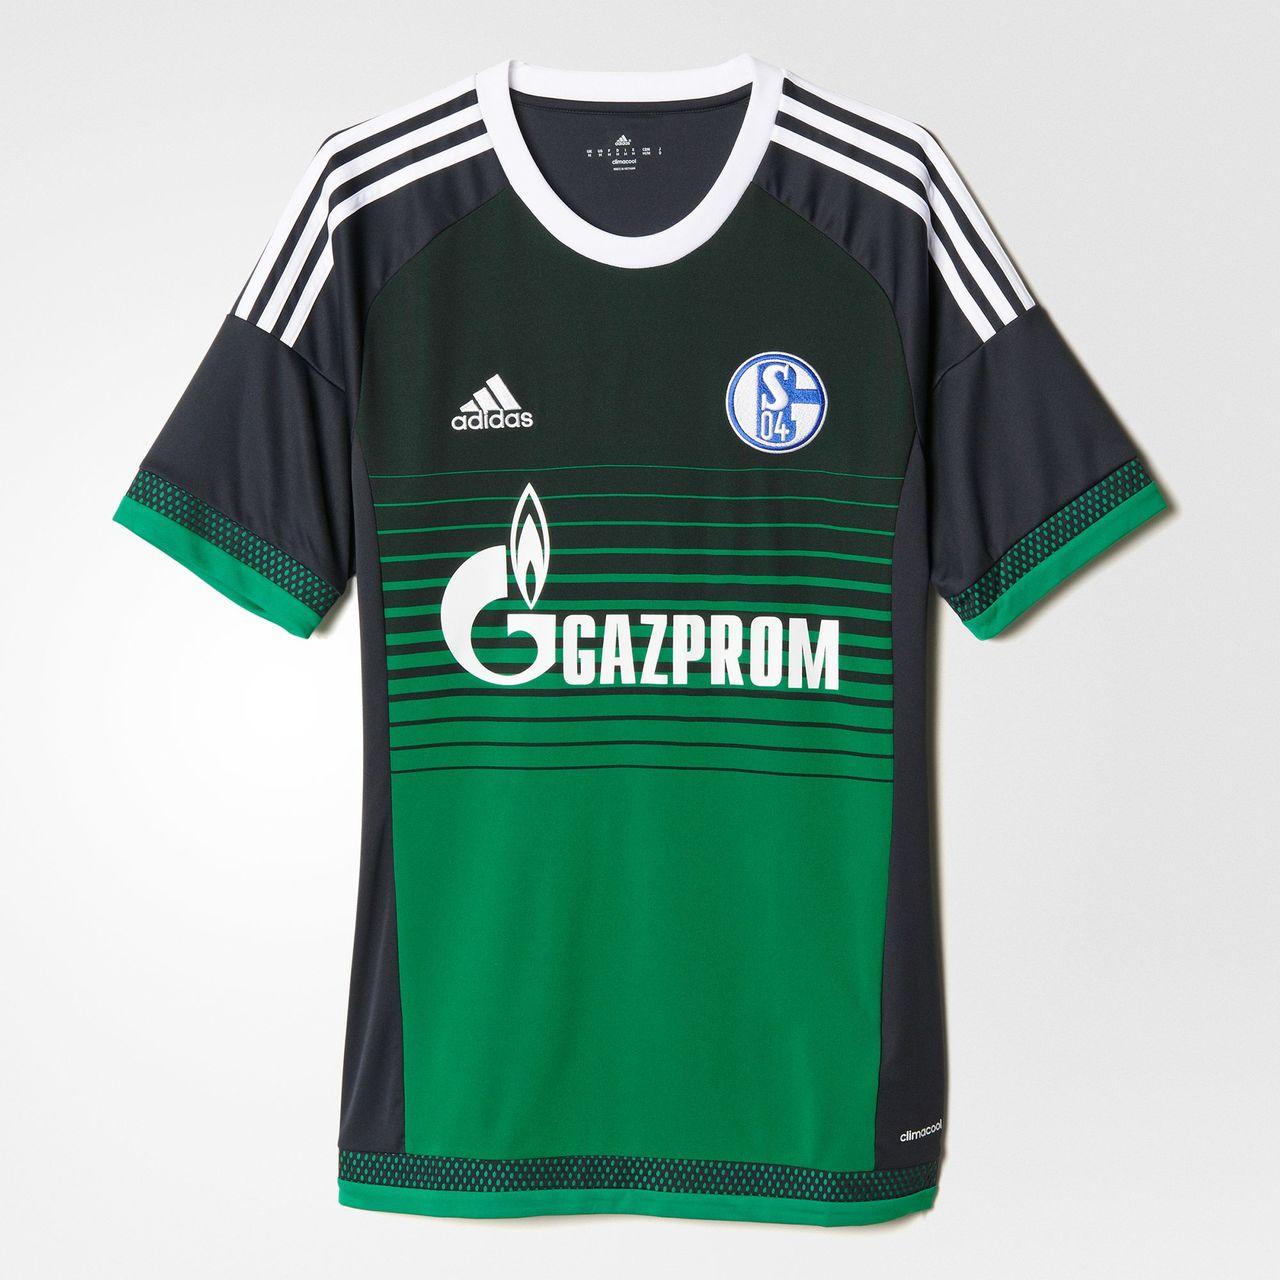 Schalke 04 Adidas 15/16 Third Football Shirt   15/16 Kits ...